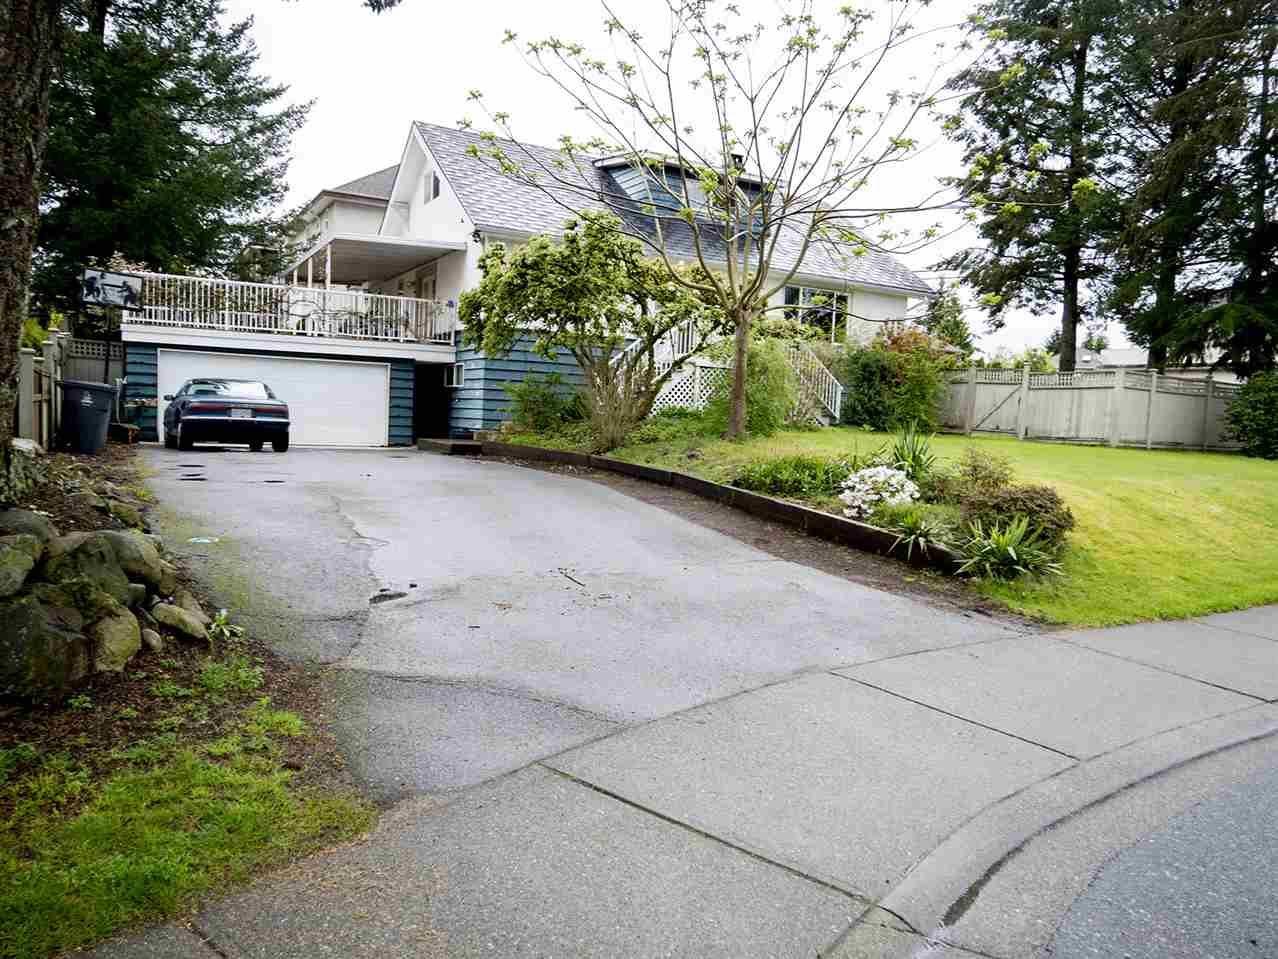 Main Photo: 8989 162 Street in Surrey: Fleetwood Tynehead House for sale : MLS®# R2162534